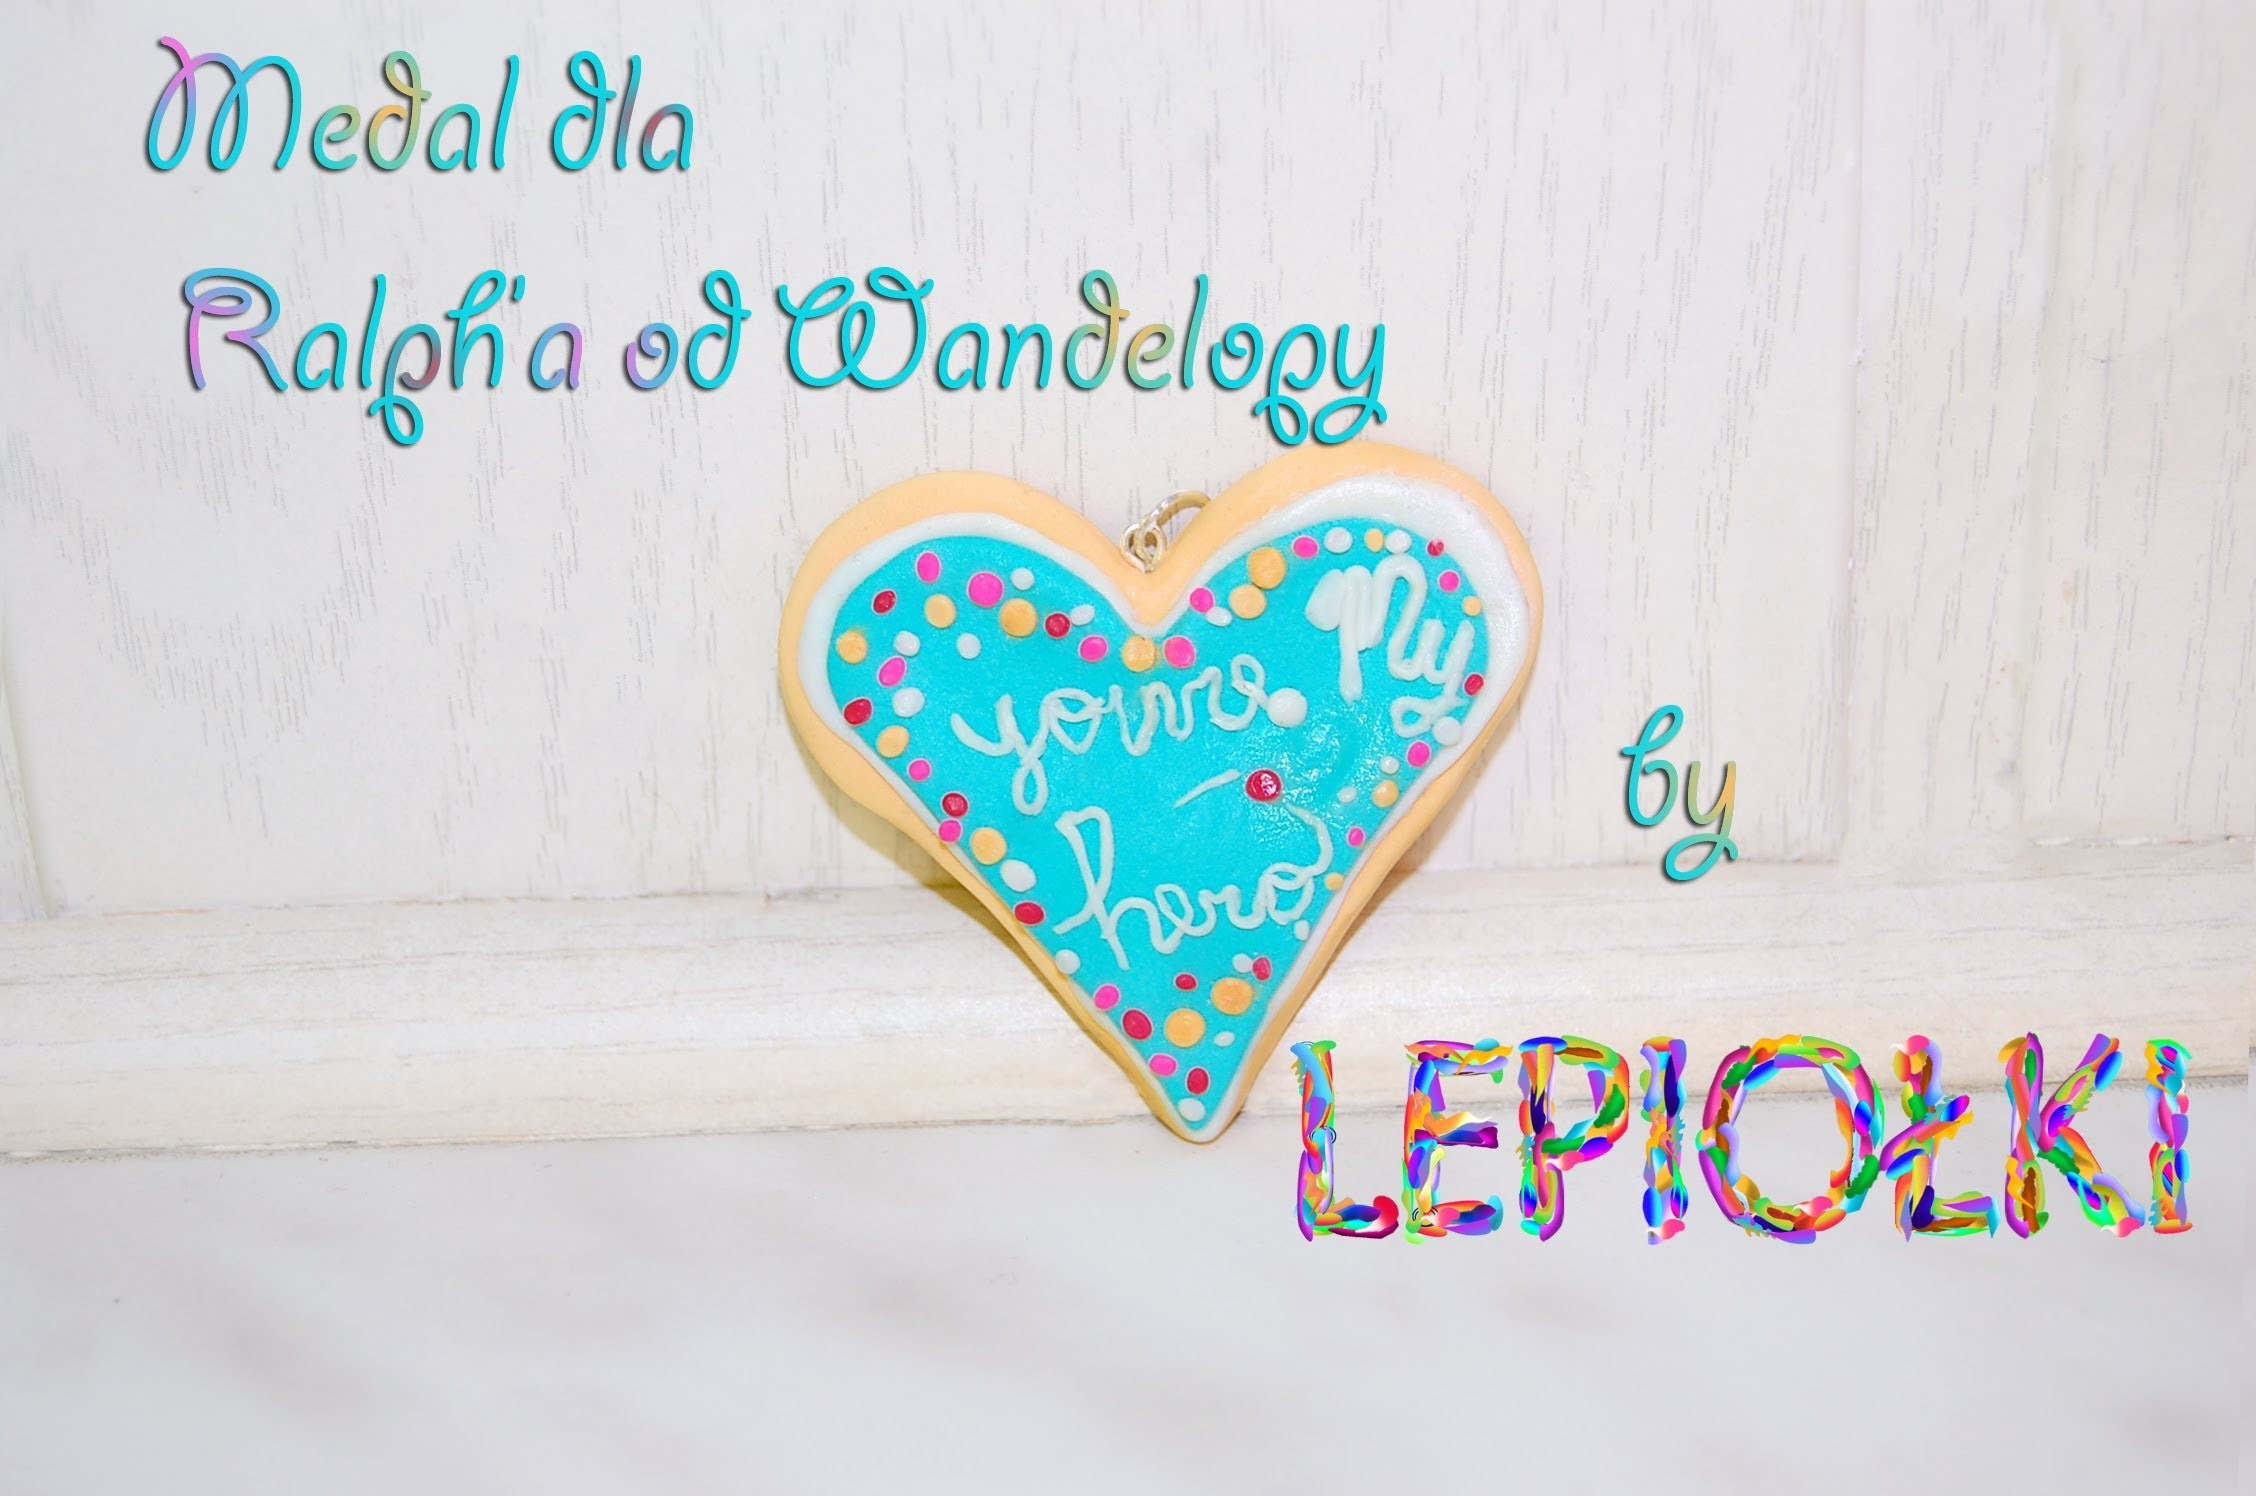 Lepiołki:Medal od Wandelopy, Medal of Wandelopy,TUTORIAL, polymer clay, made hand